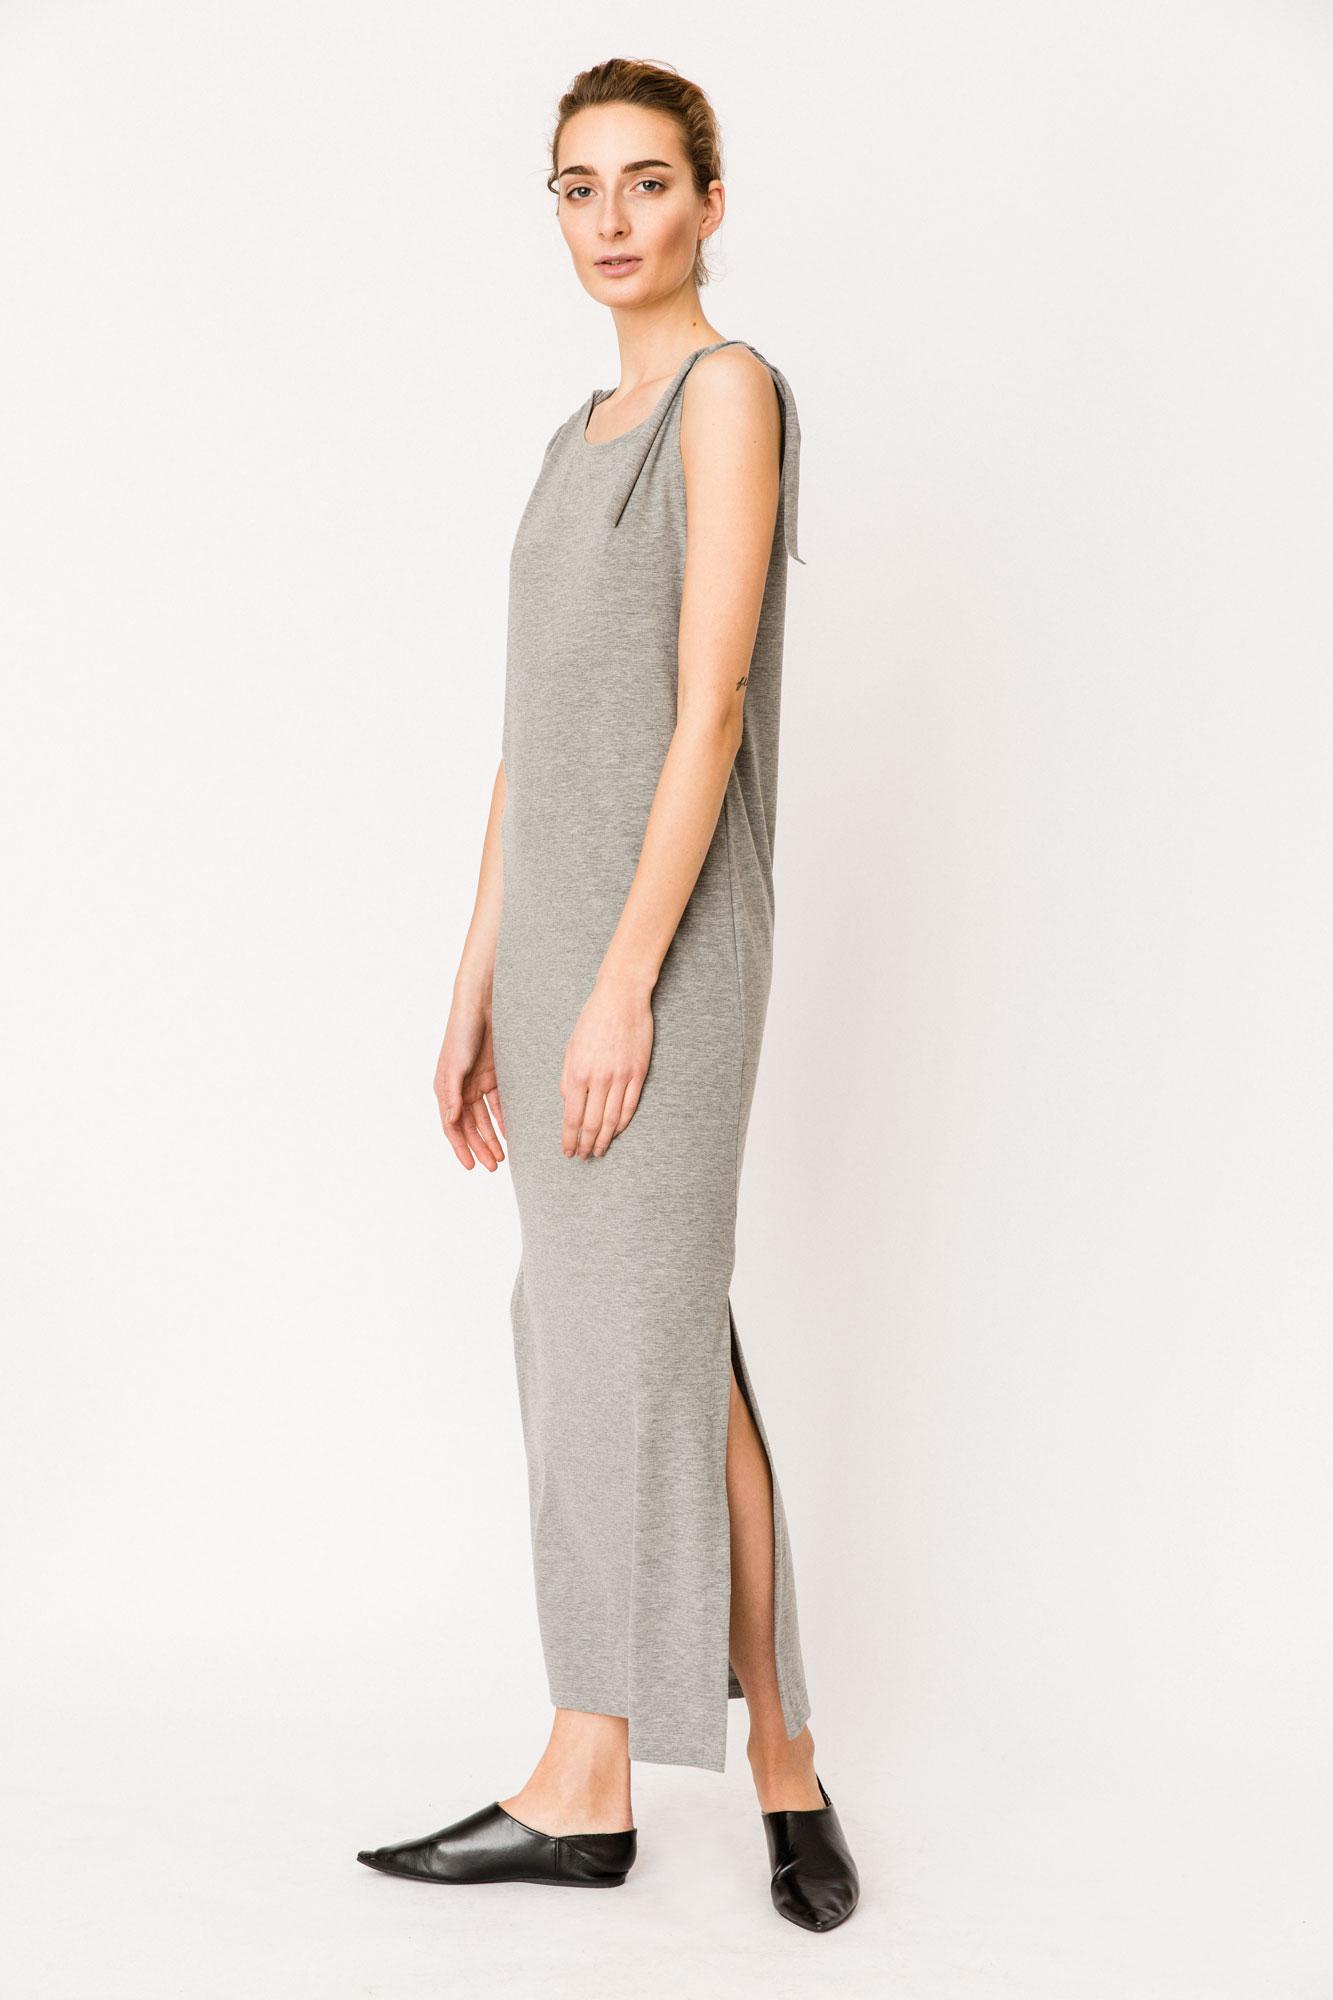 WRNS_BASICS_Nod-Dress_02